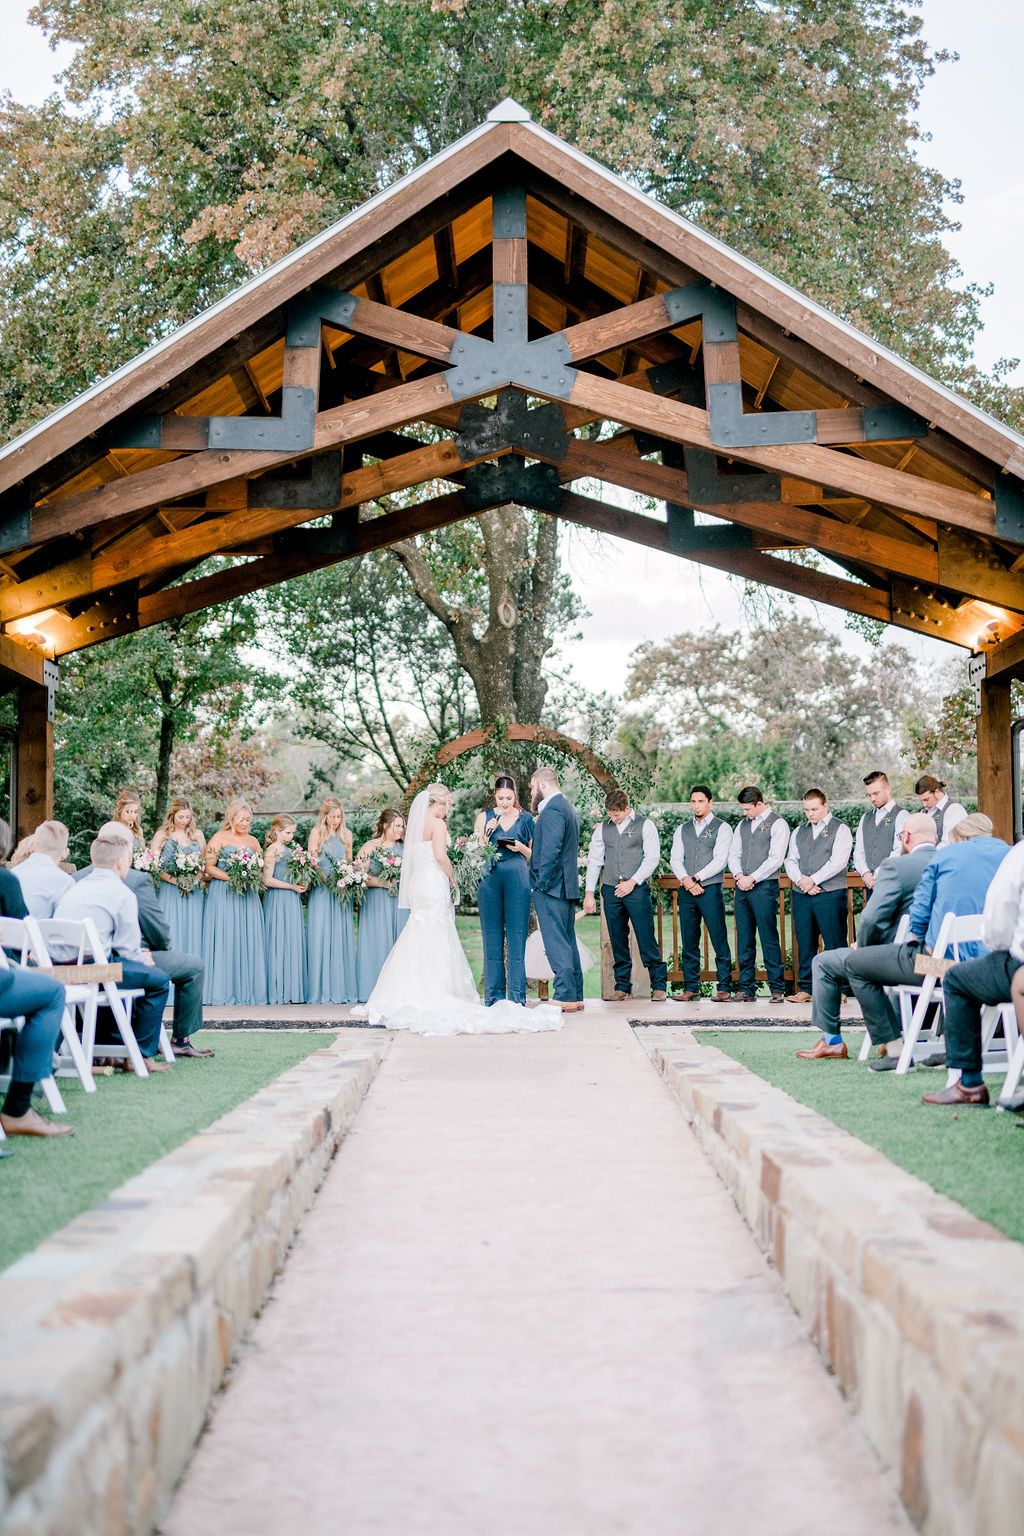 Outdoor Ranch Wedding Venue Outdoor Southern Wedding Venue Best Texas Wedding Venues Wedding Venues Texas Ranch Wedding Venue Rustic Wedding Venues Texas